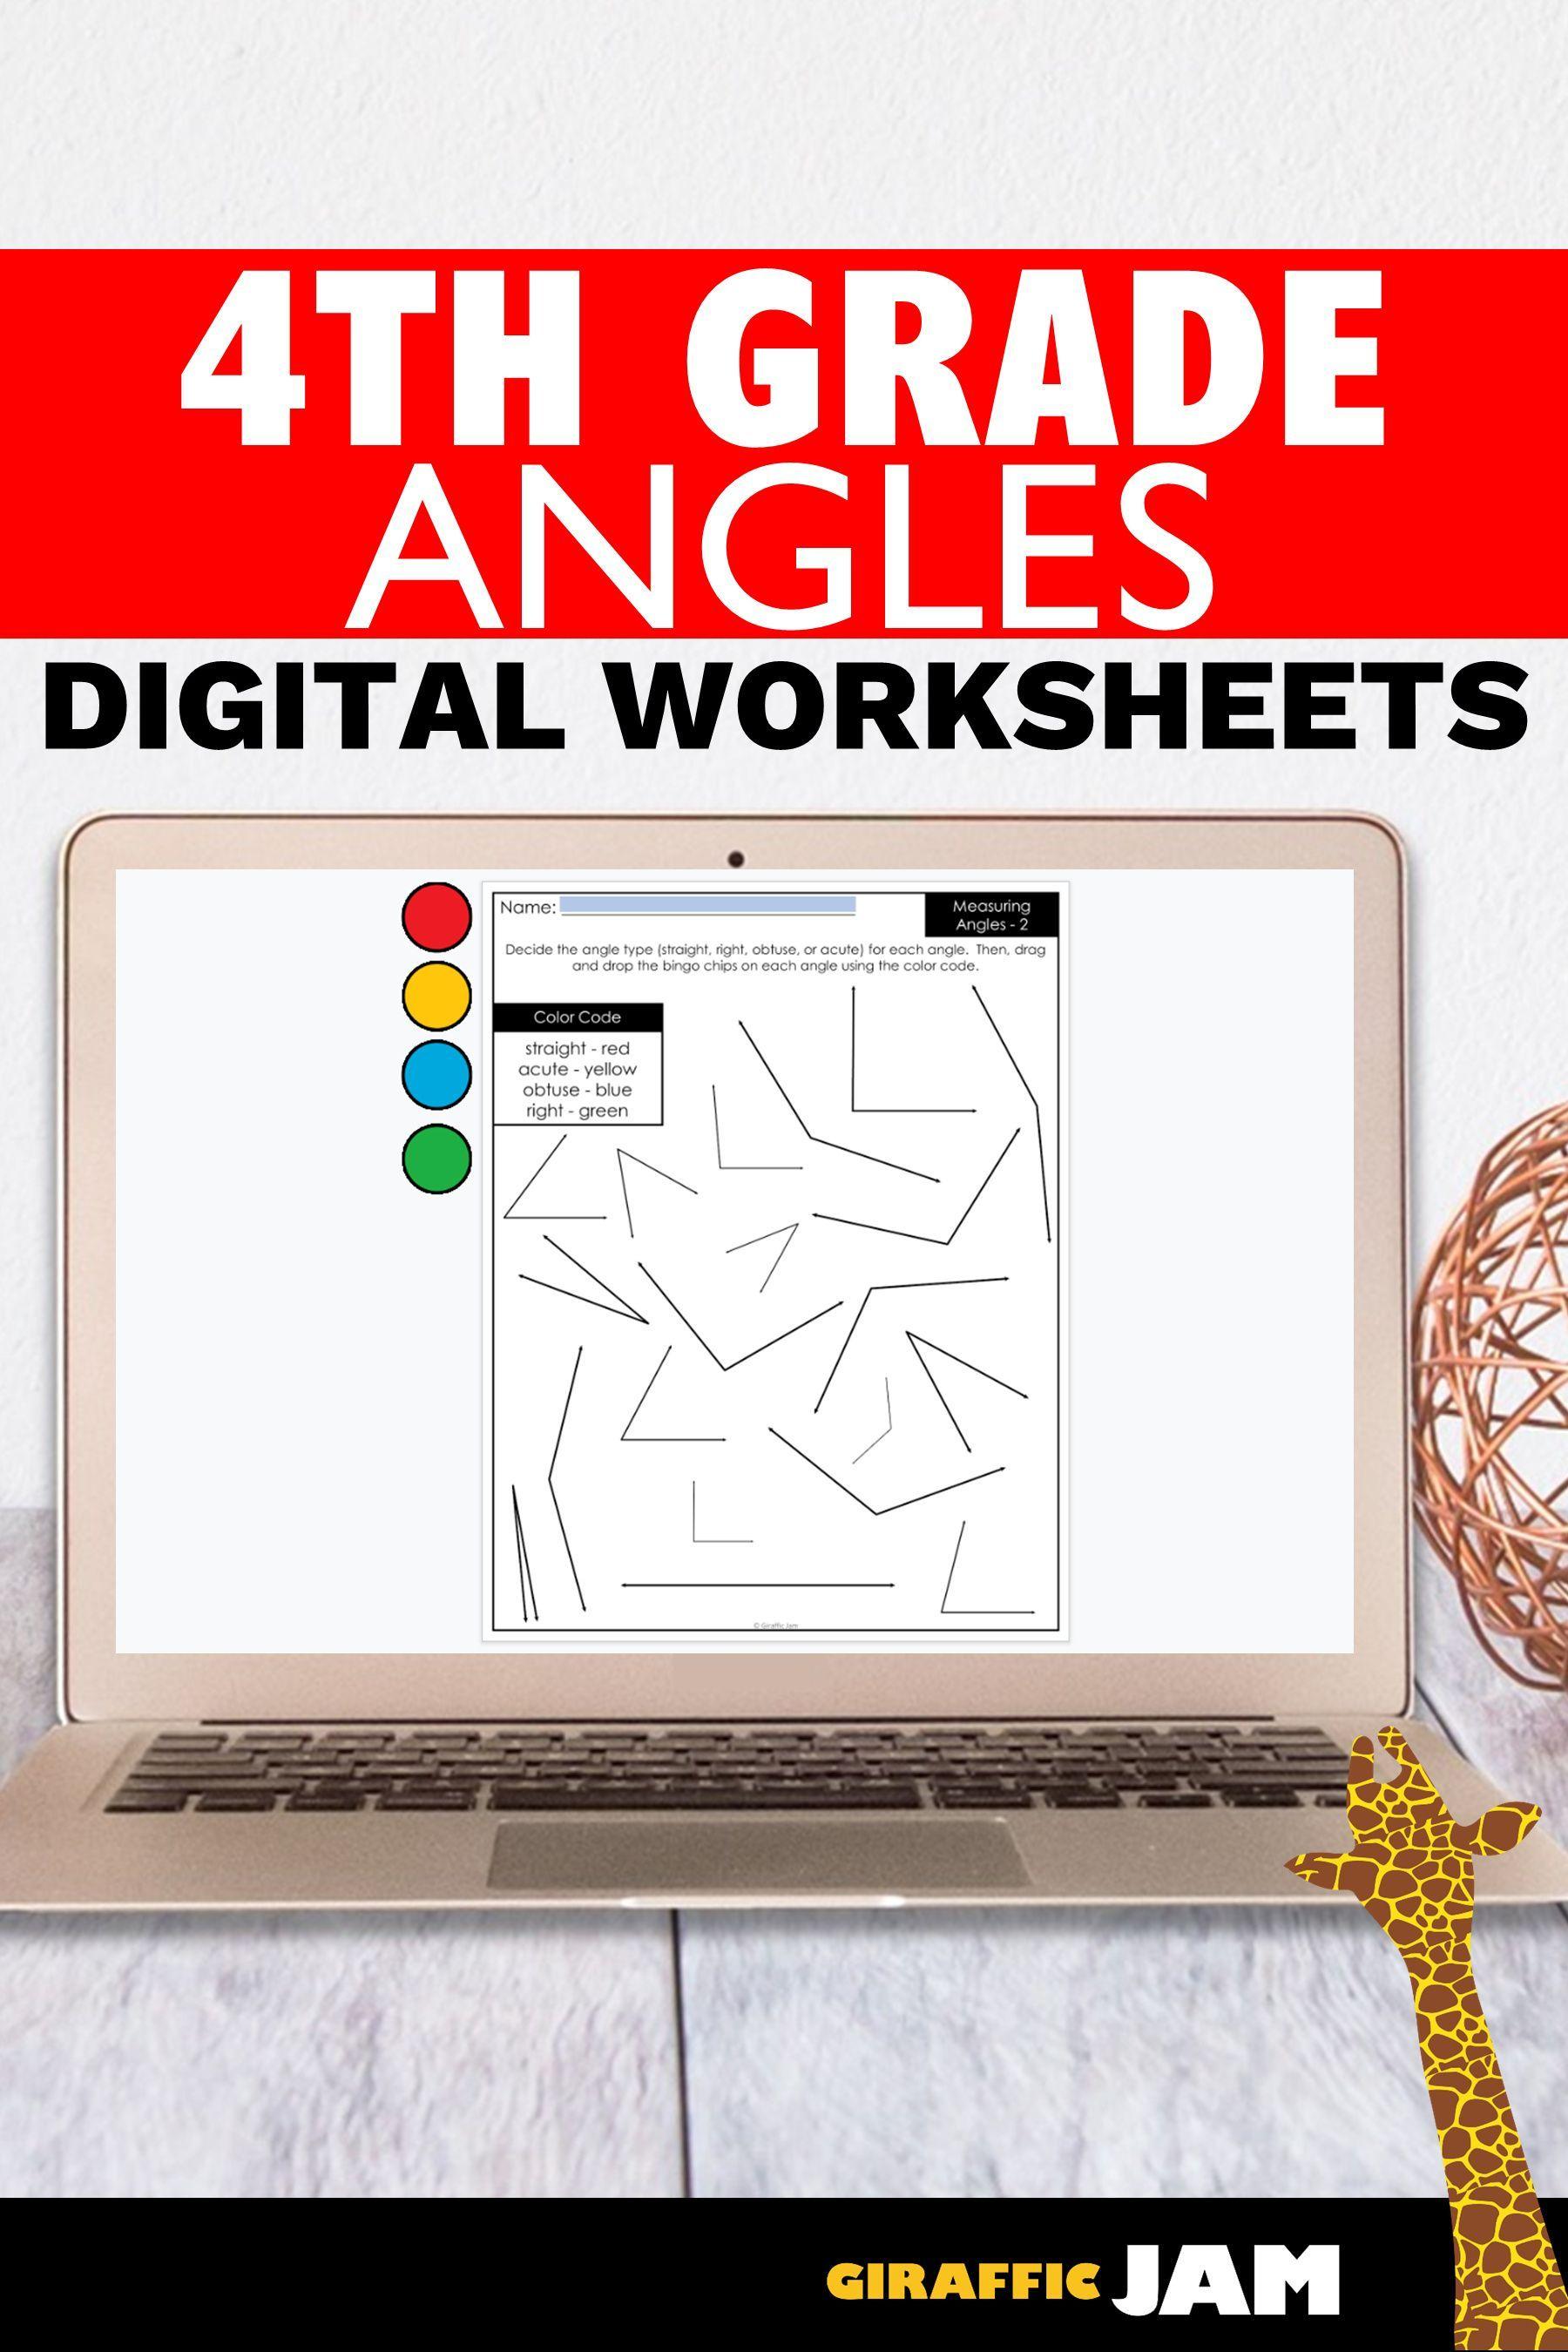 4th Grade Measurement Measurement Worksheets Angles Measuring Angles Digital Works Measurement Worksheets Google Classroom Google Classroom Activities [ 2700 x 1800 Pixel ]